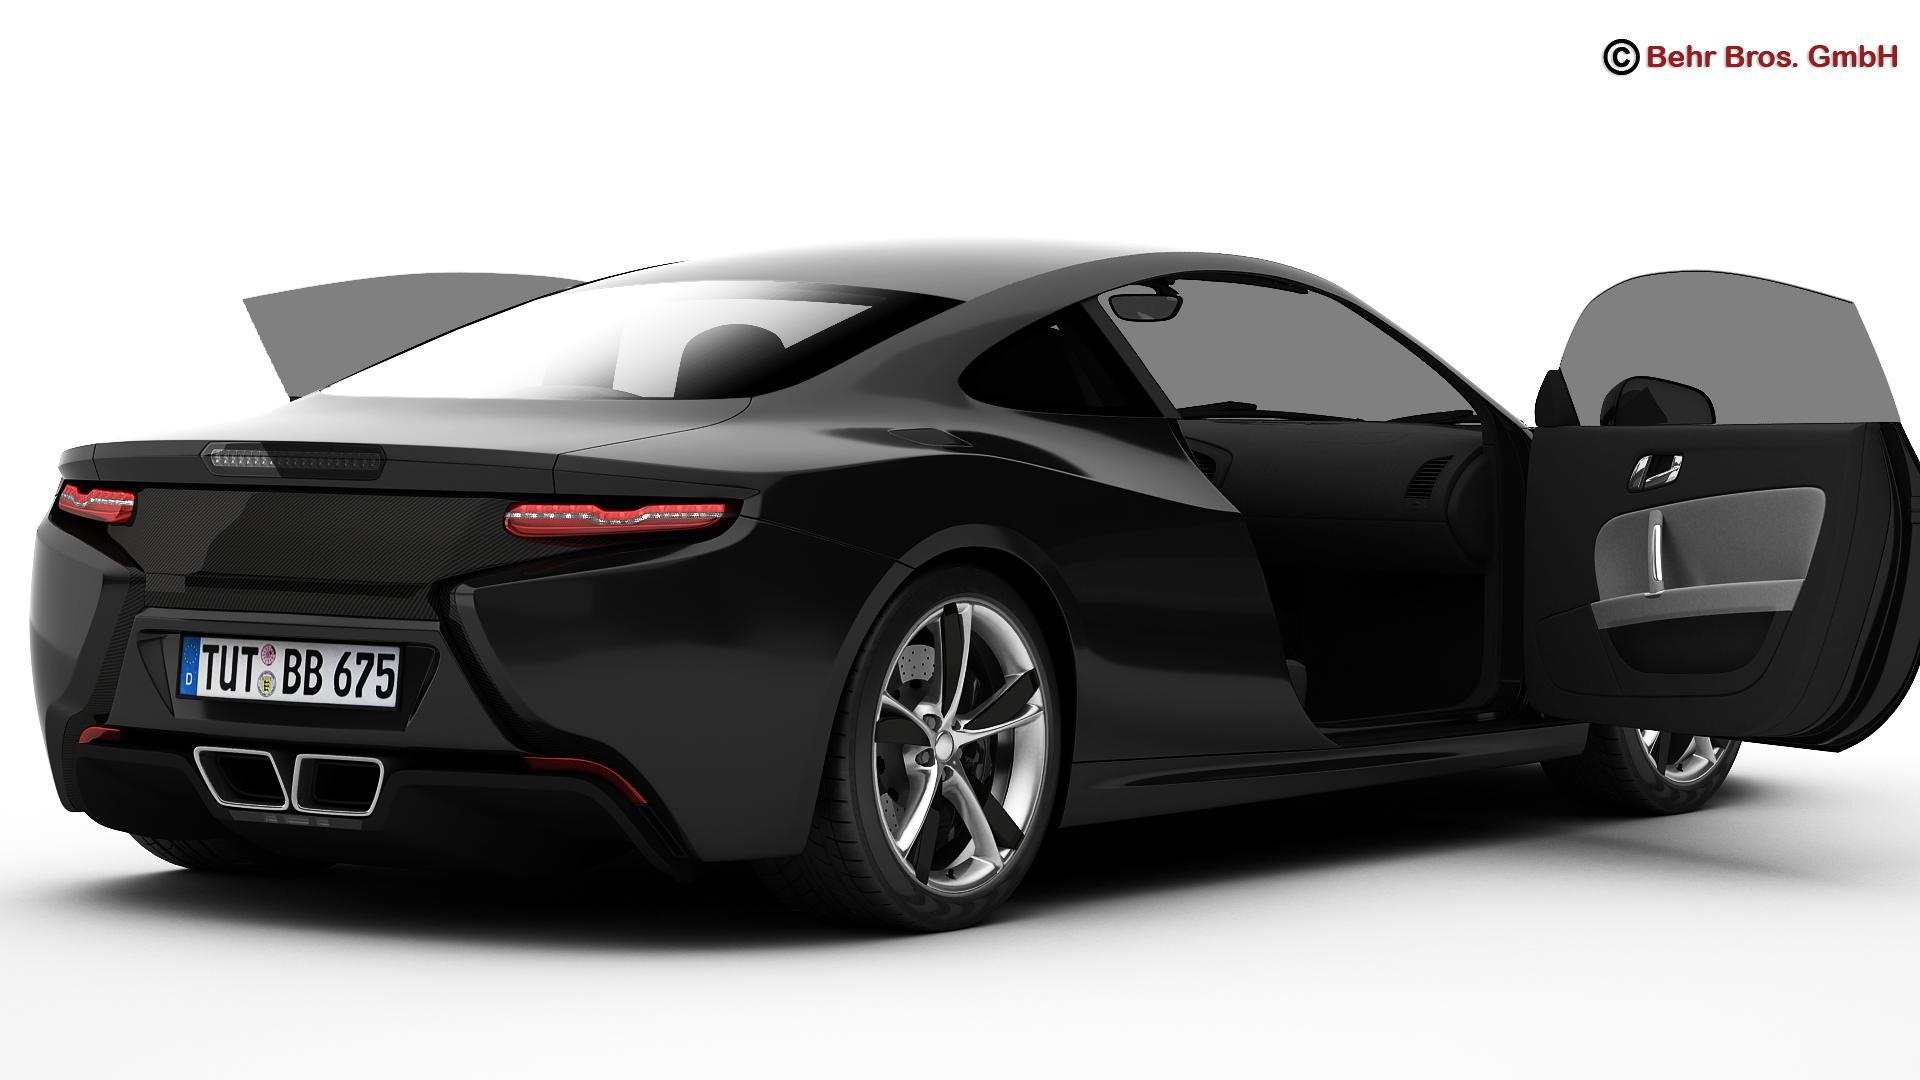 generic sports car 3d model 3ds max fbx c4d lwo ma mb obj 160524